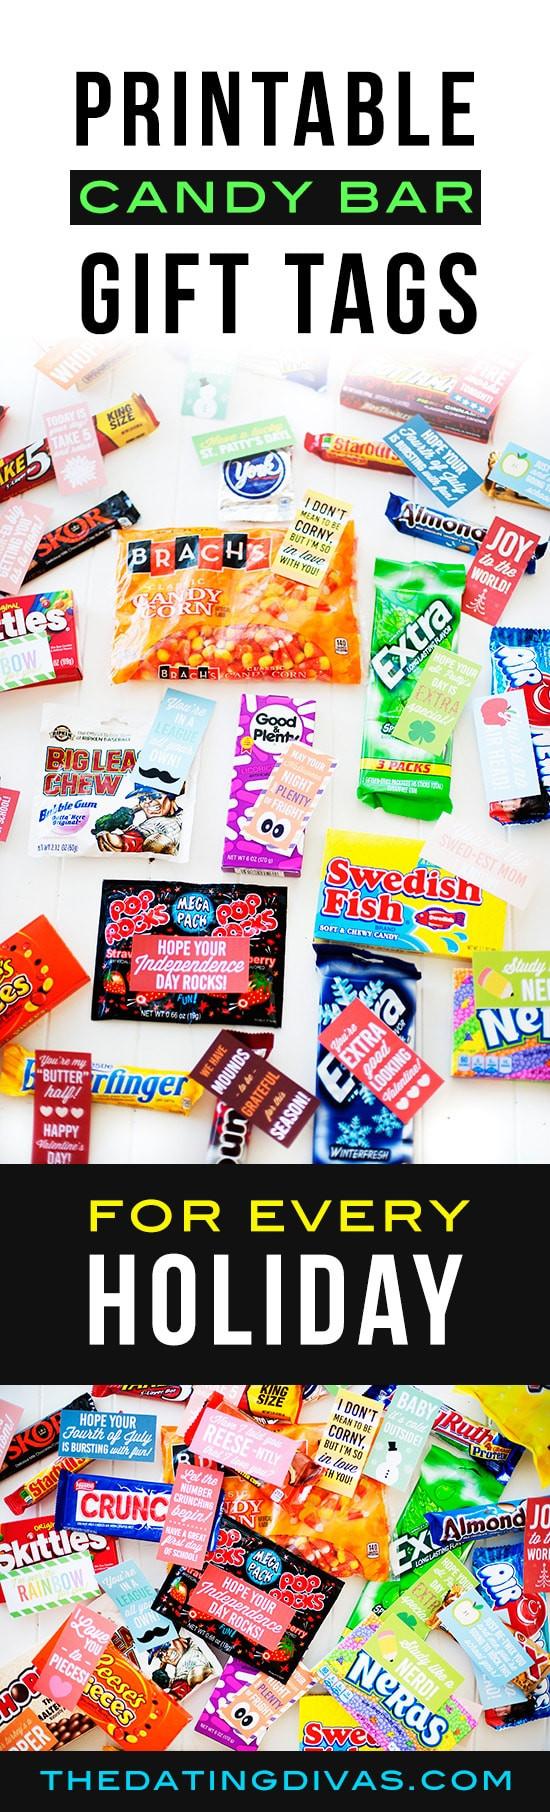 Christmas Candy Sayings  Holiday Candy Bar Gift Tags